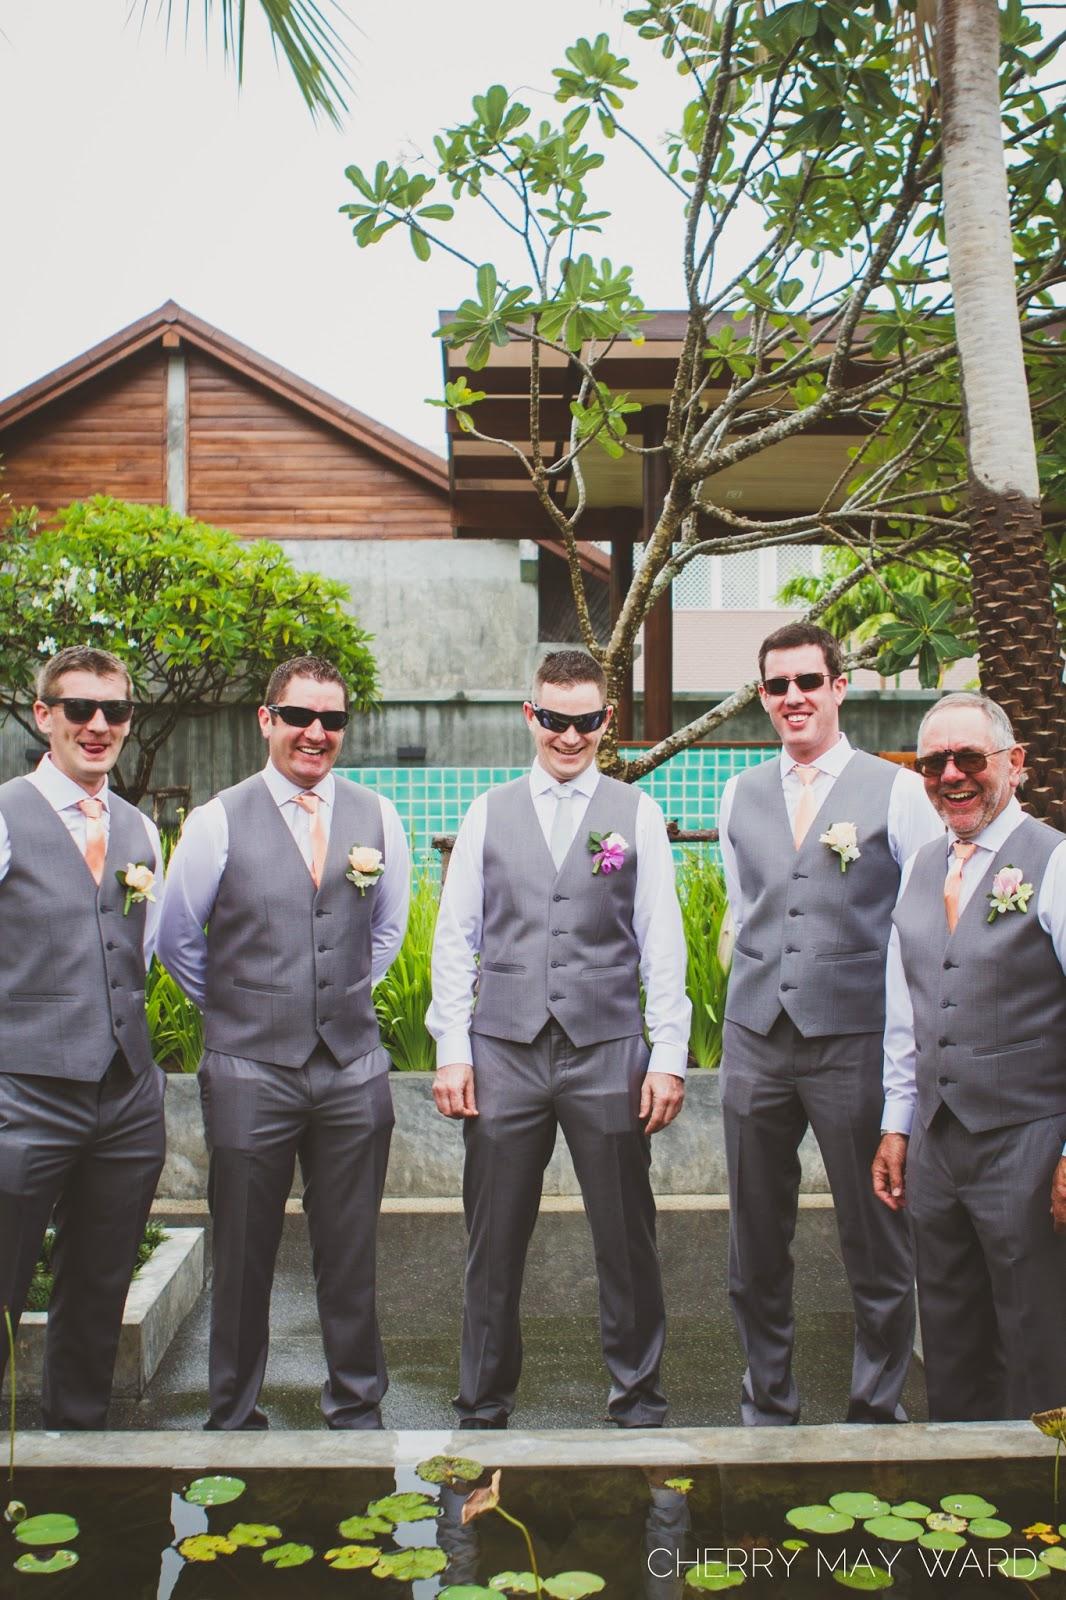 Photos of groom and groomsmen, thailand wedding photo ideas, natural photos of groom and his friends,